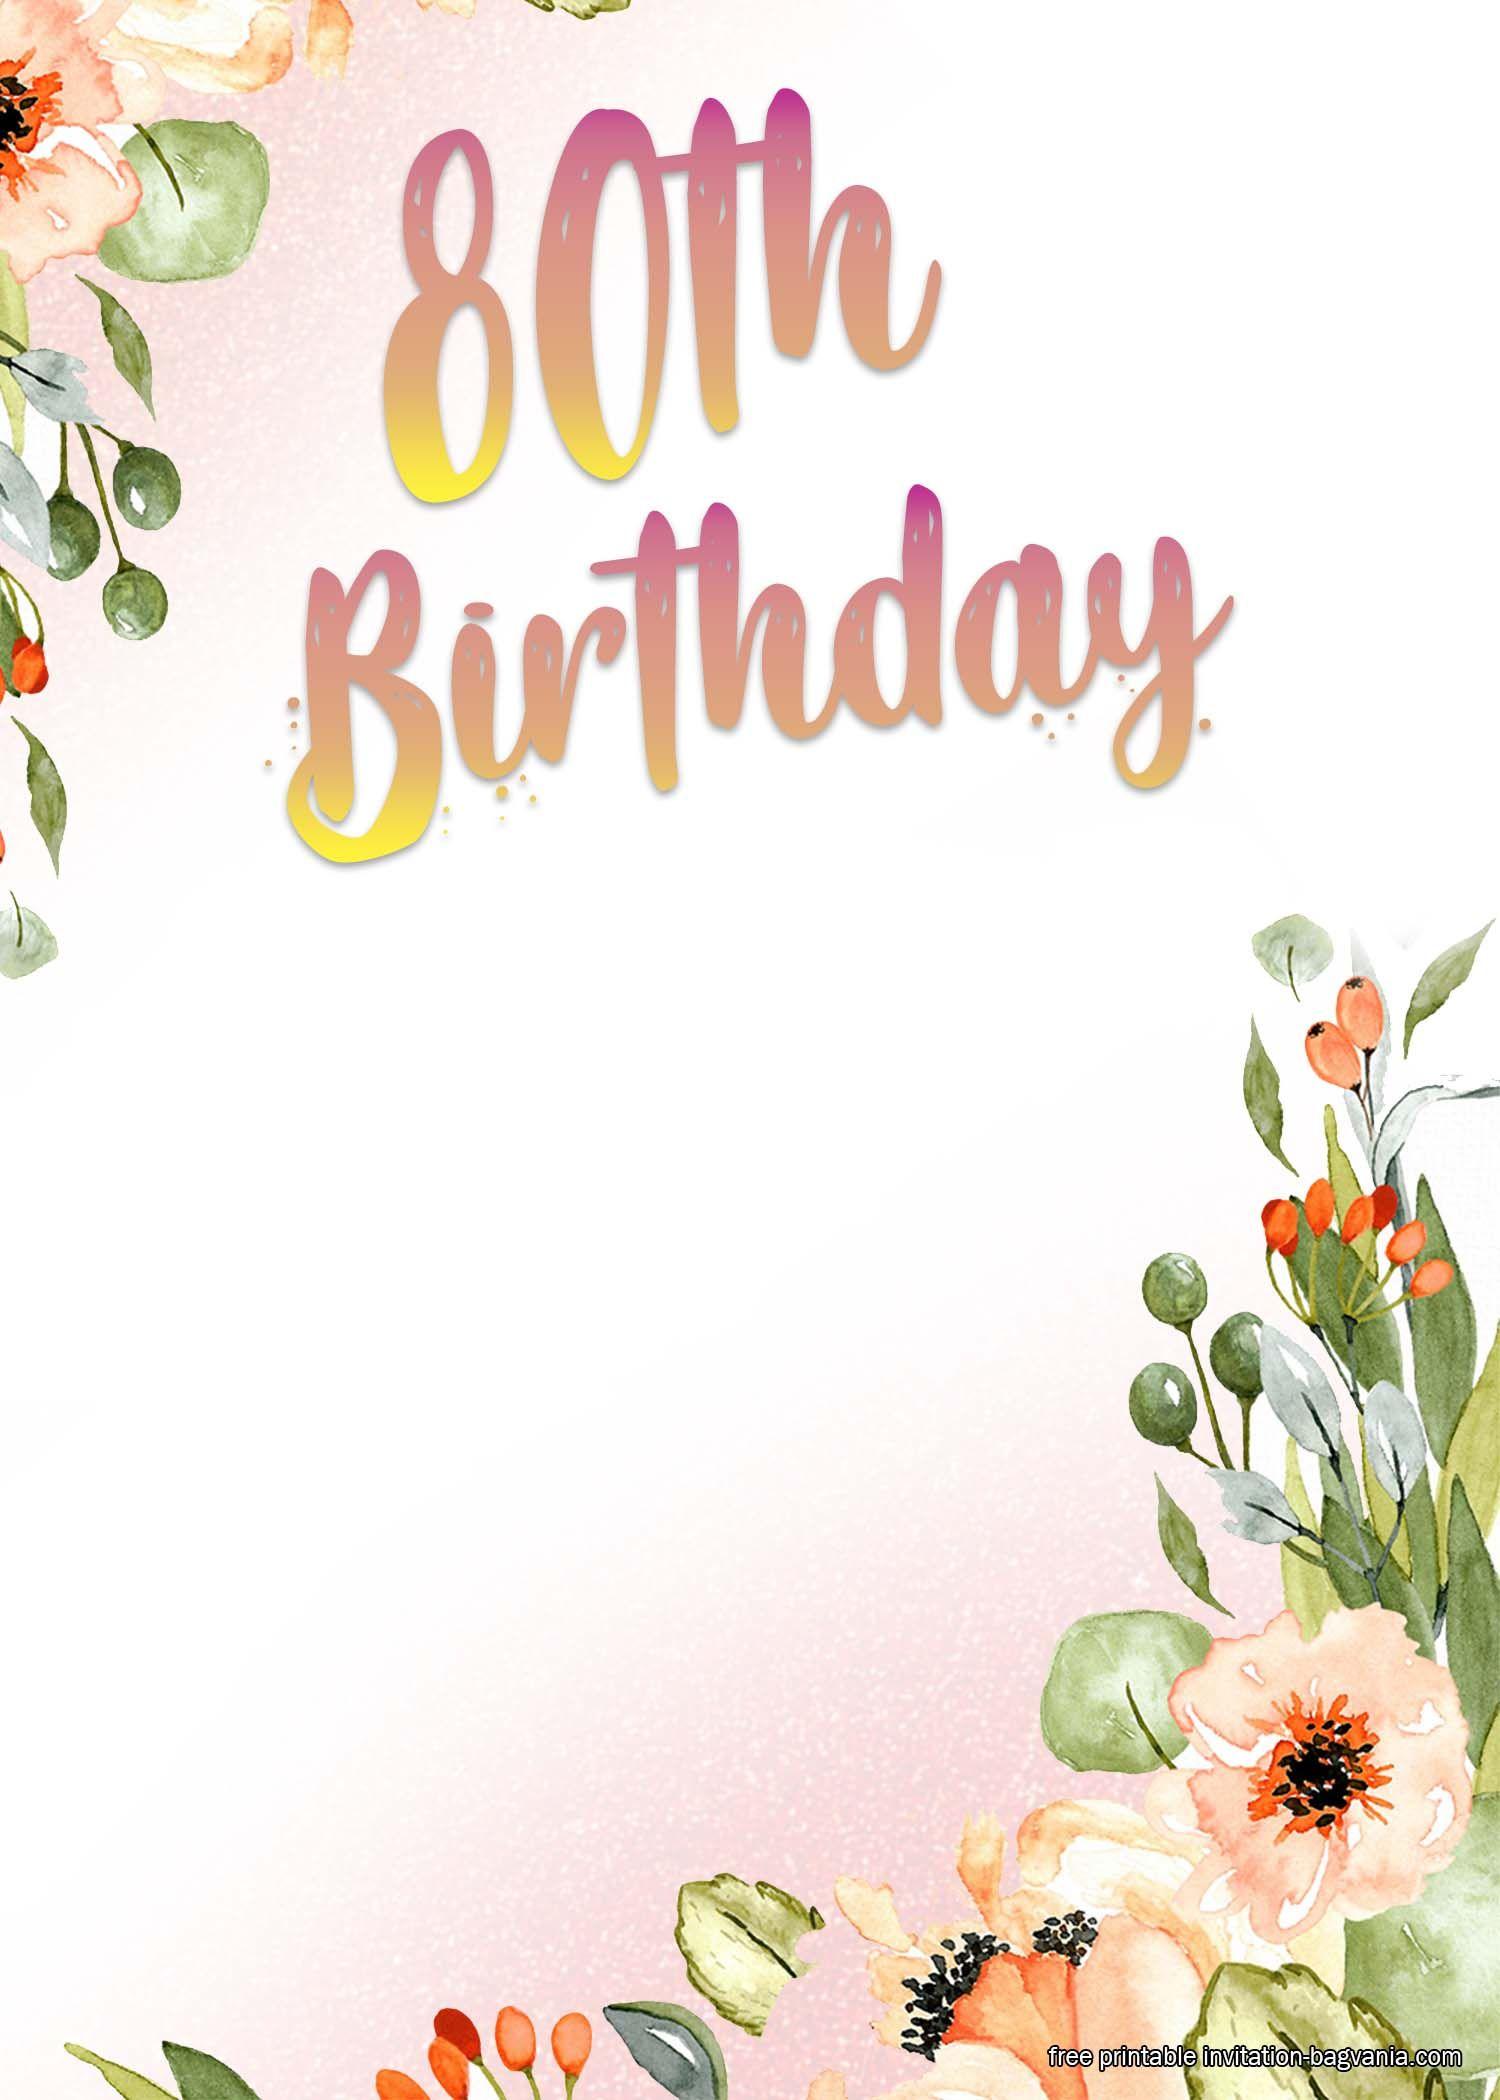 Free Printable 80th Birthday Invitation Templates 80th Birthday Invitations Birthday Invitation Templates Birthday Invitations